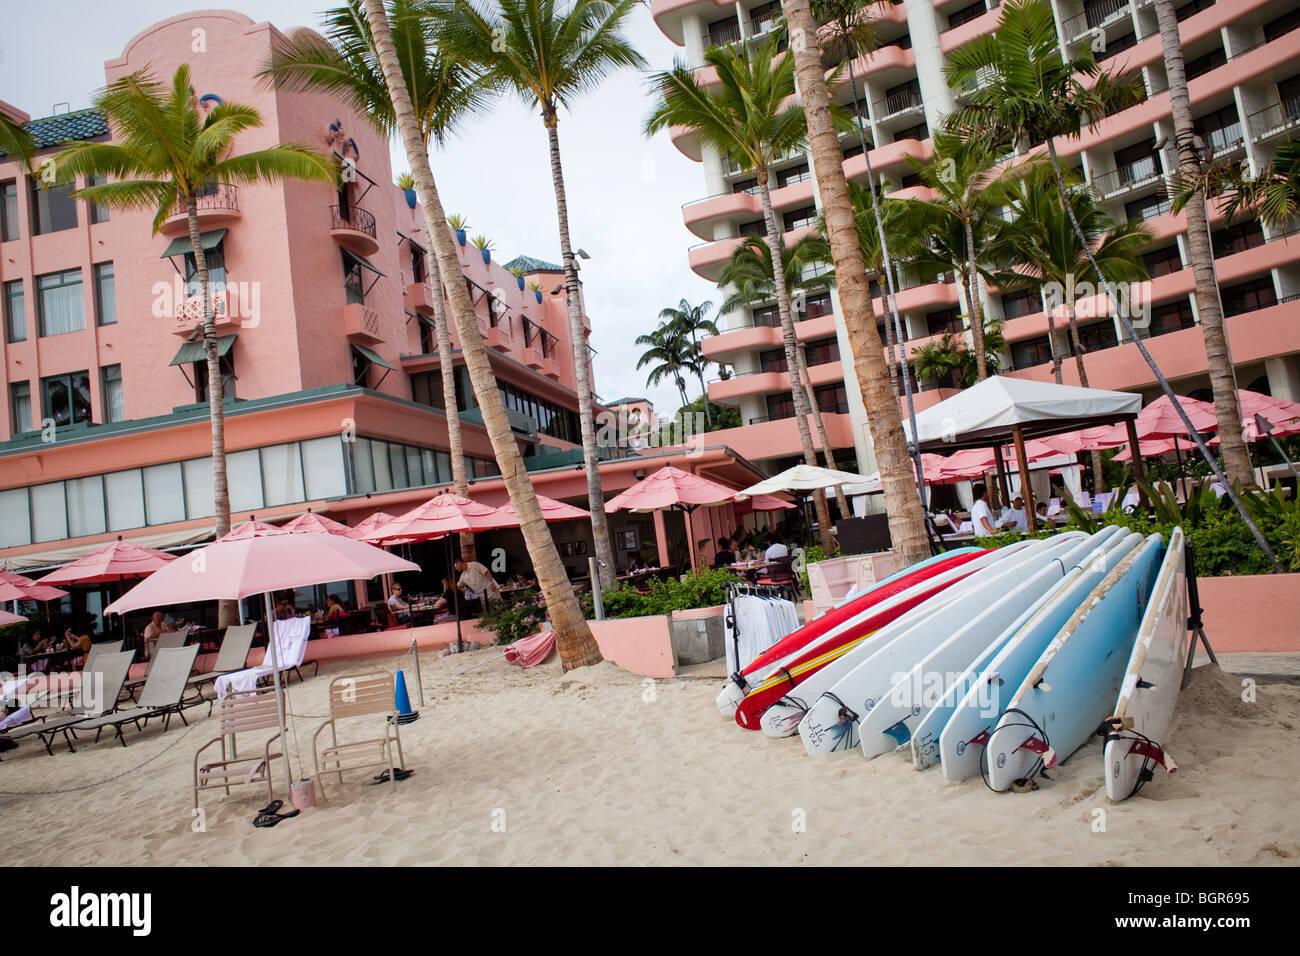 The pink Royal Hawaiian Hotel on Waikiki beach - Stock Image